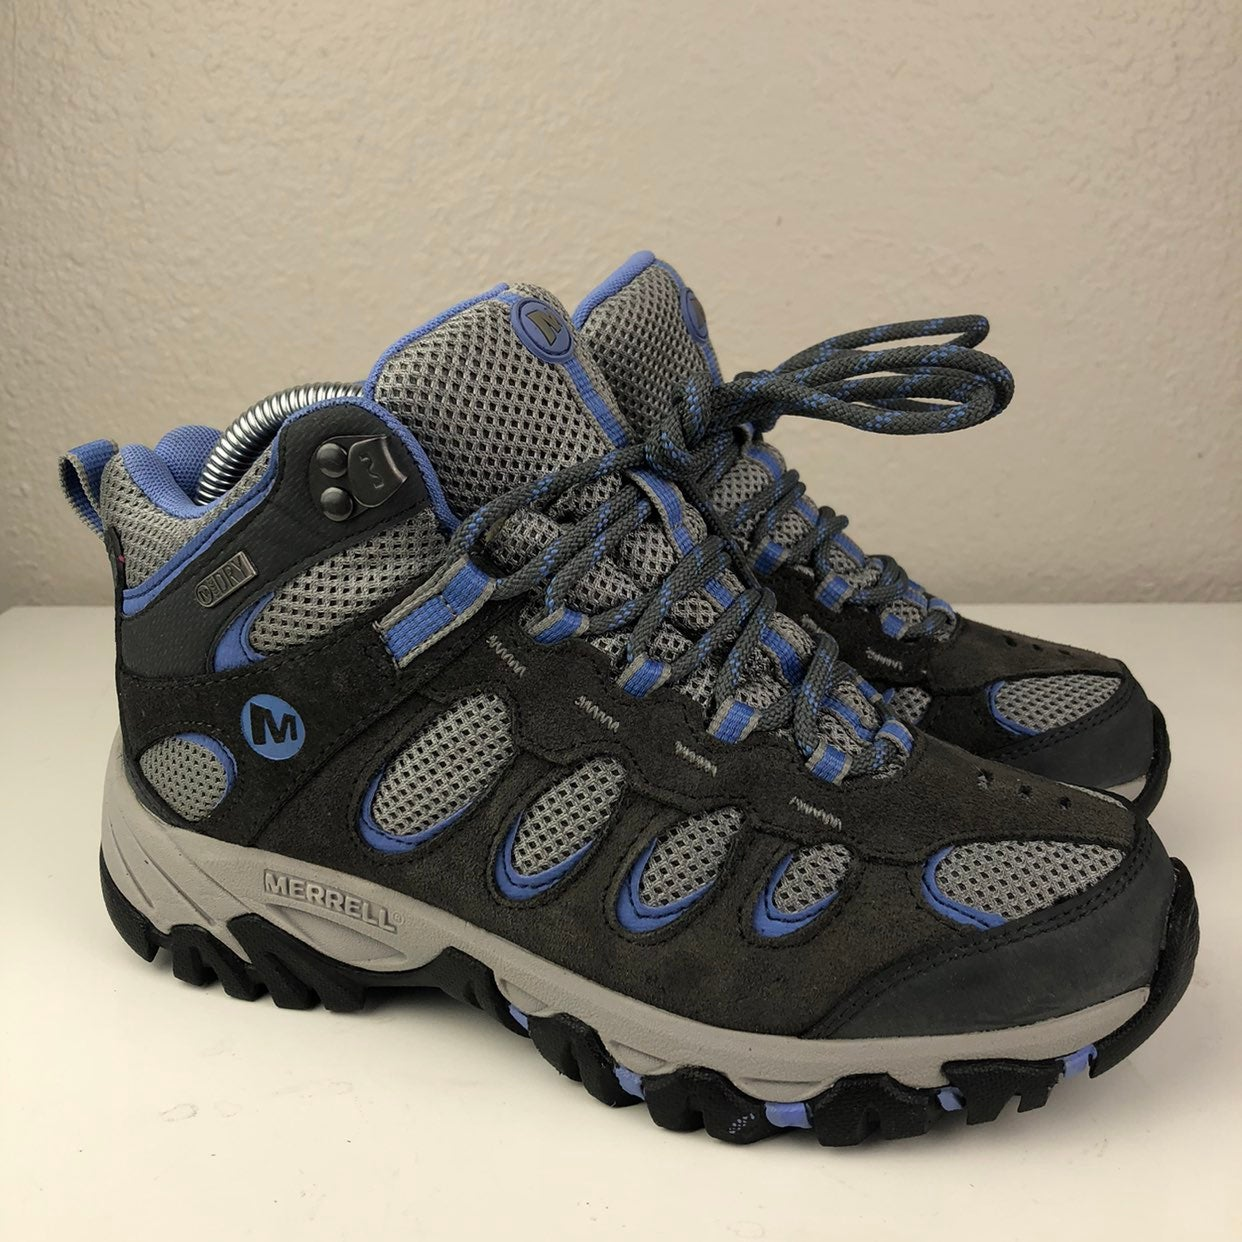 Merrell Womens Hiking Boots